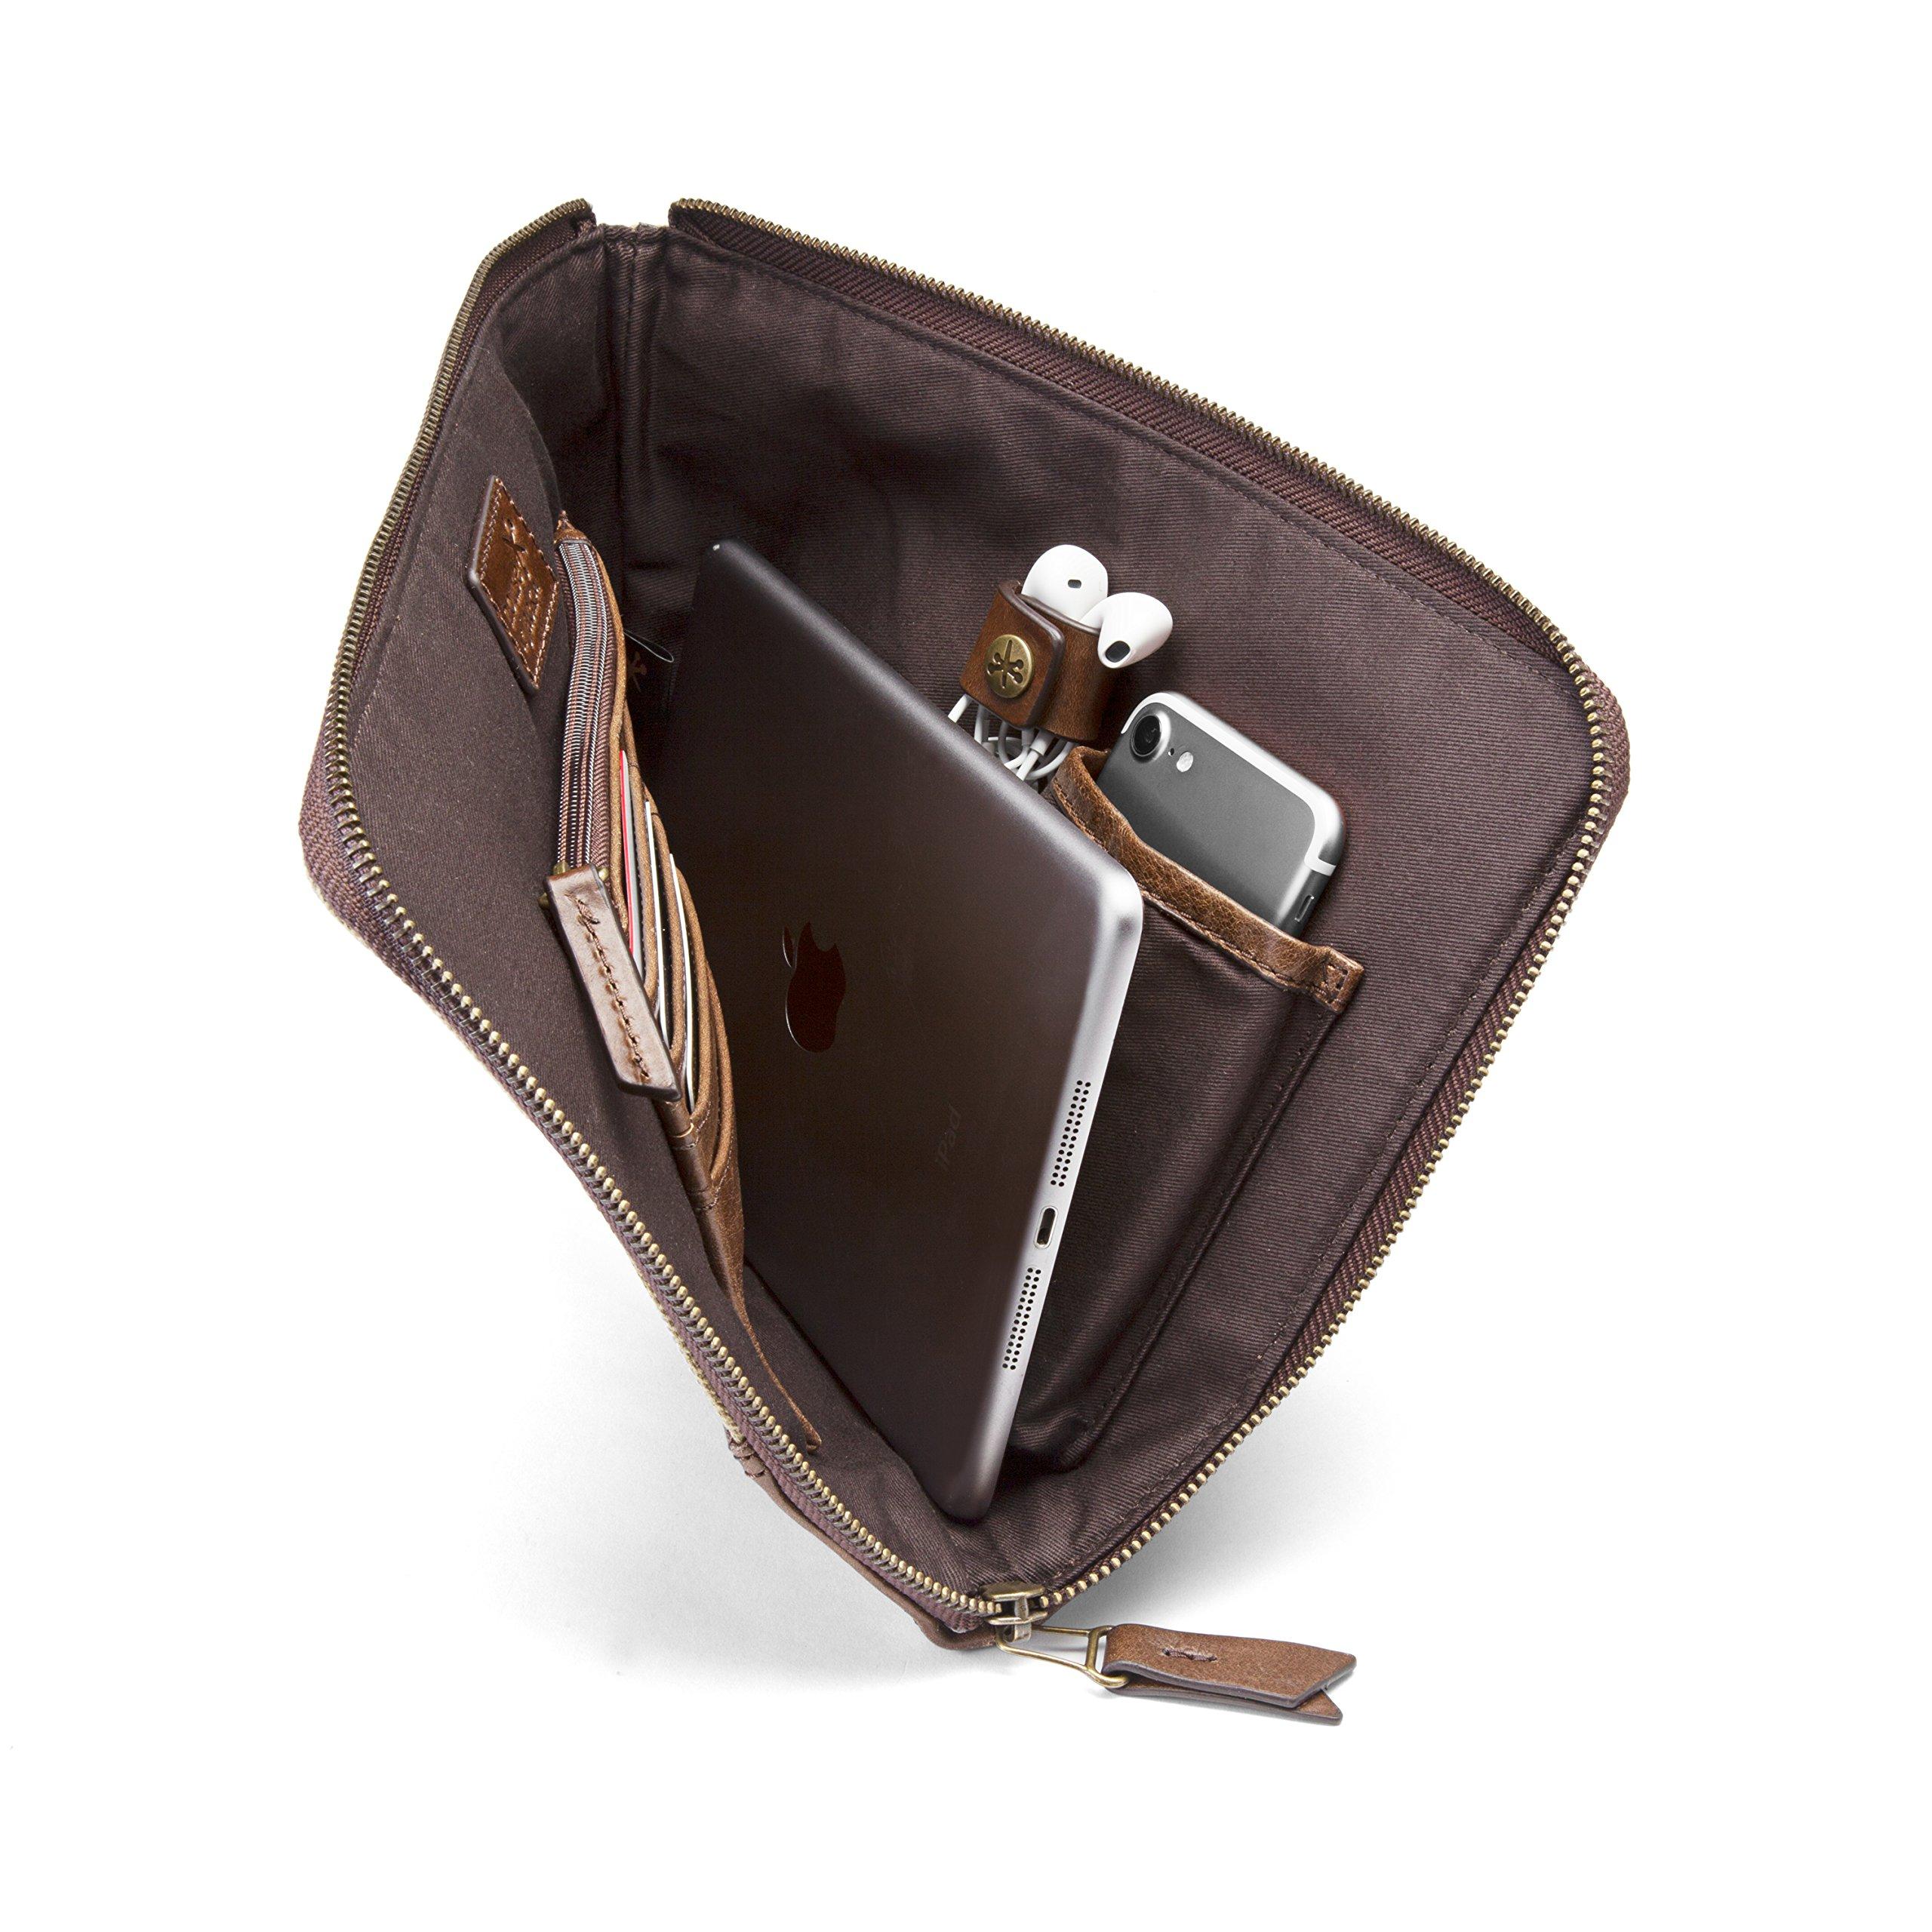 HOJ Co. TRAVEL ORGANIZER Bag-Tech Organizer-Travel Wallet-iPad Case-Travel Bag